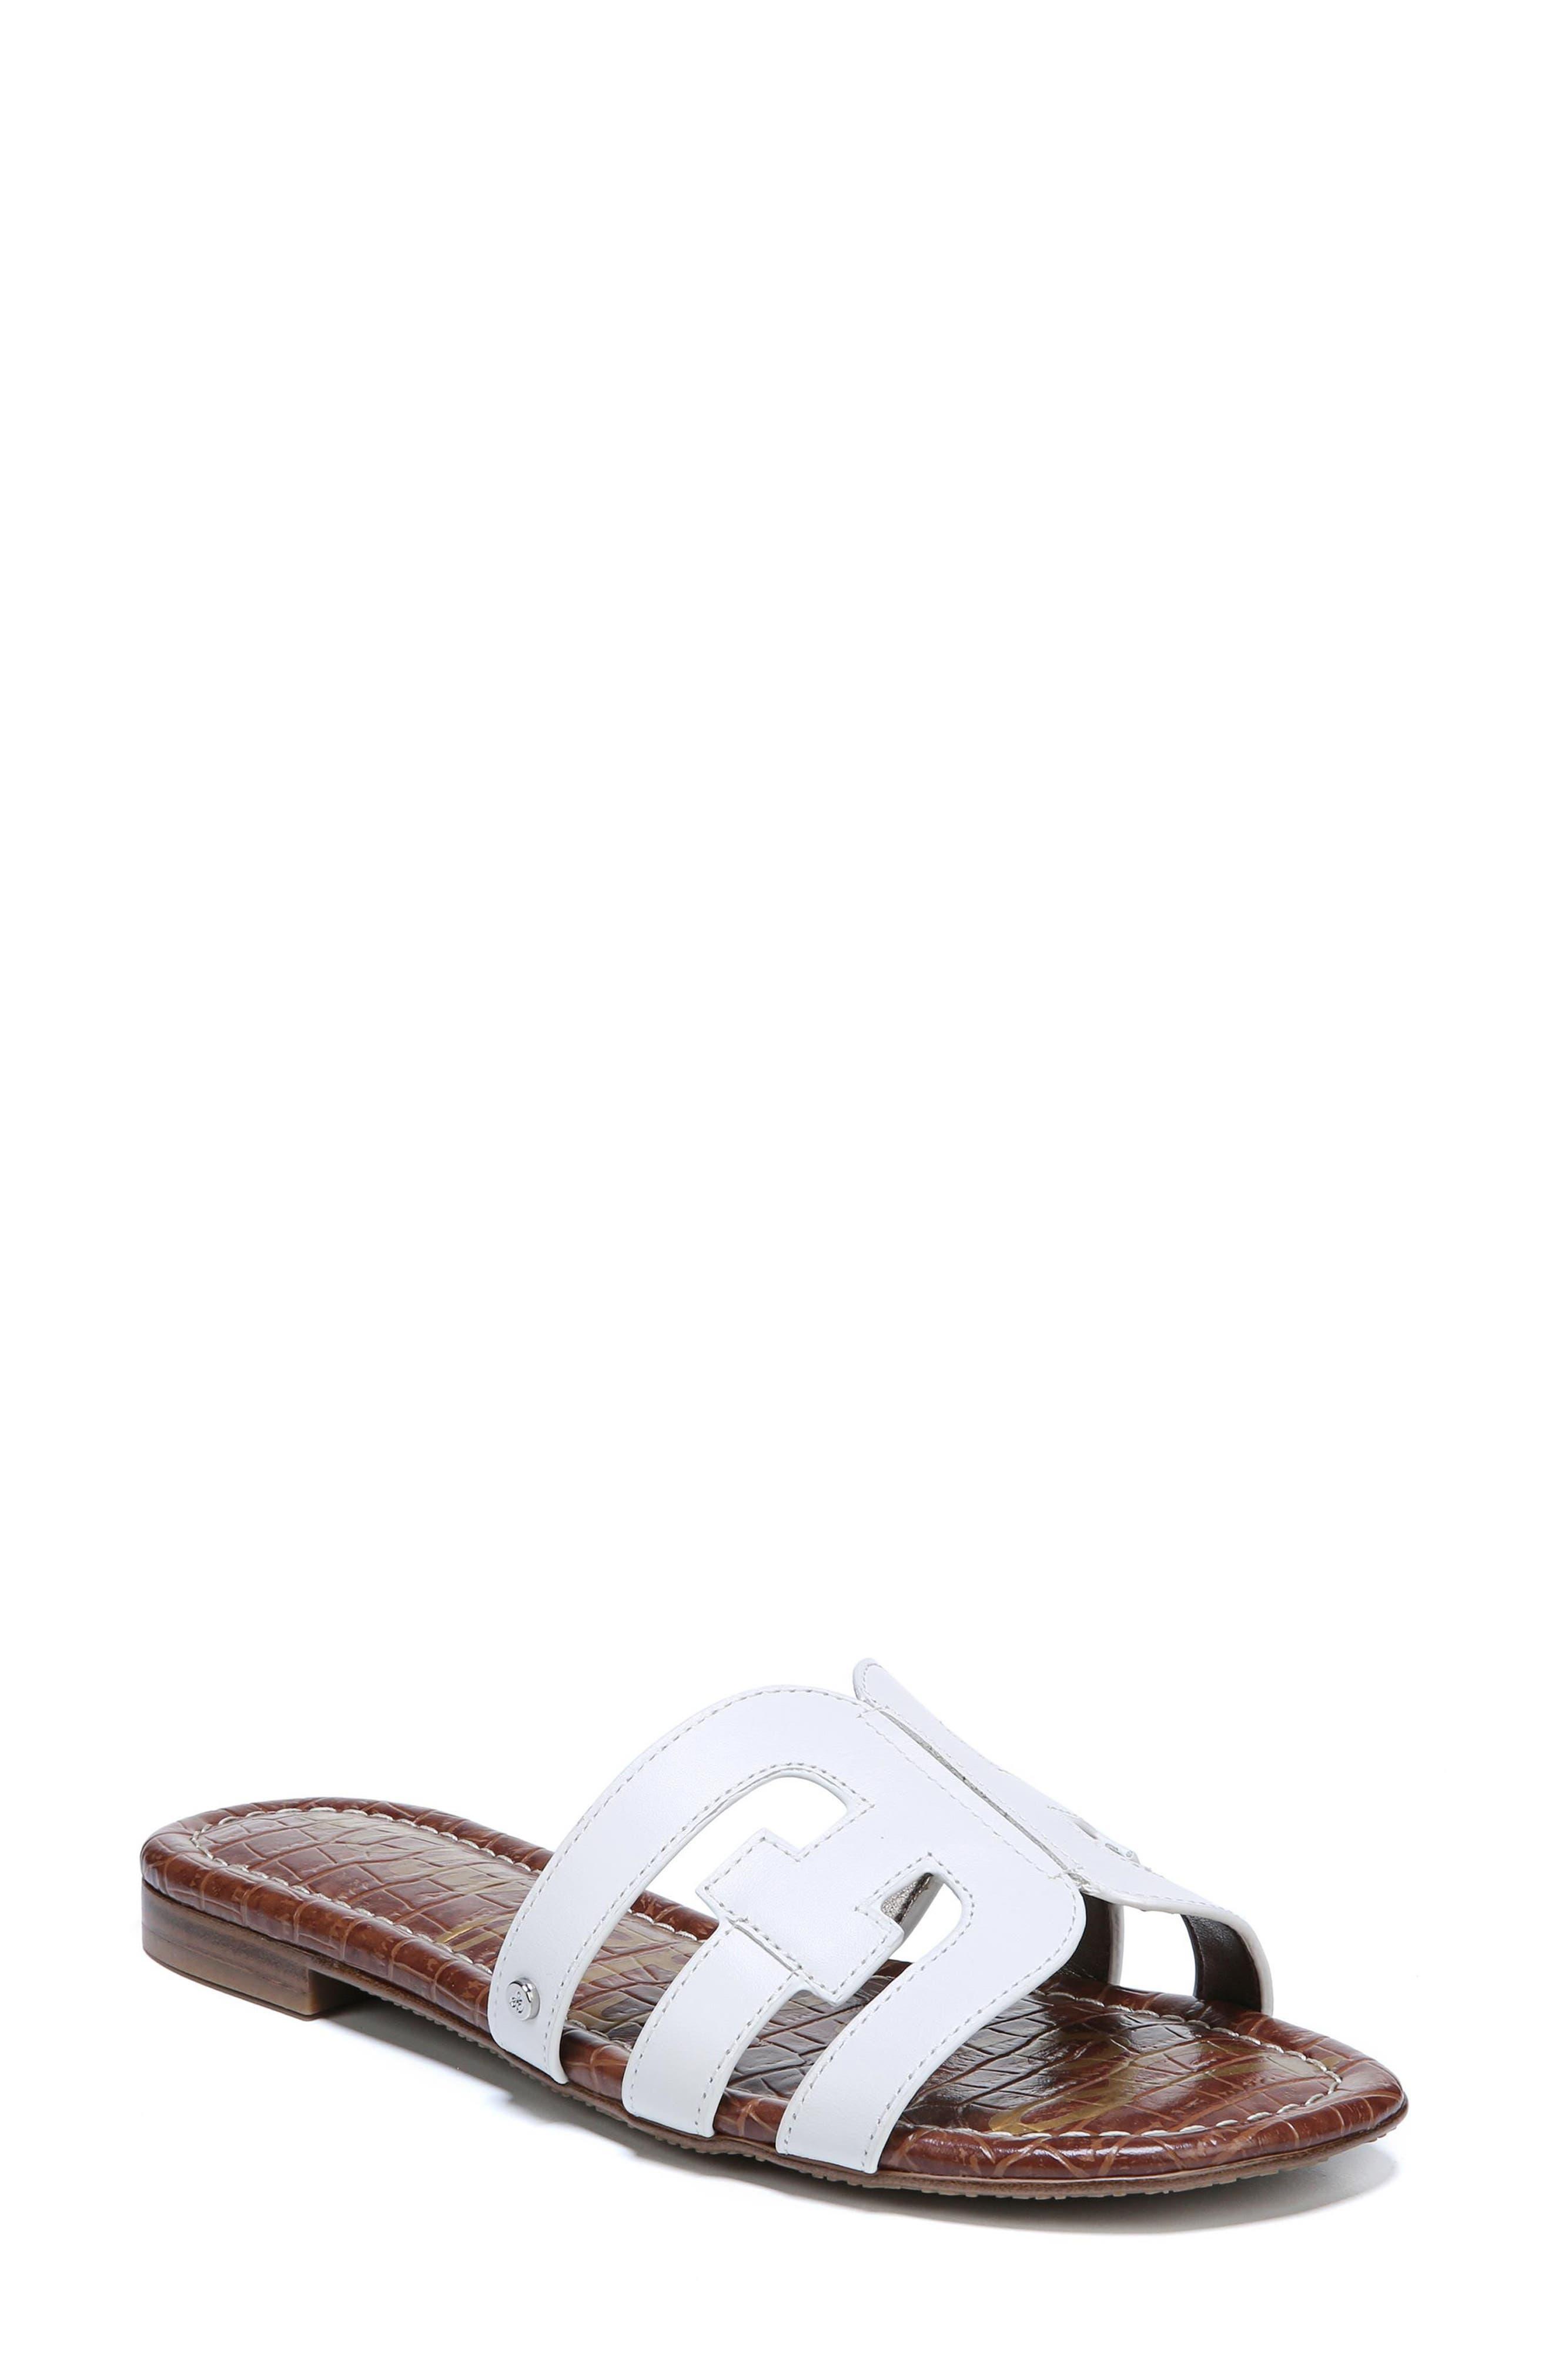 Bay Cutout Slide Sandal,                             Main thumbnail 1, color,                             Bright White Leather